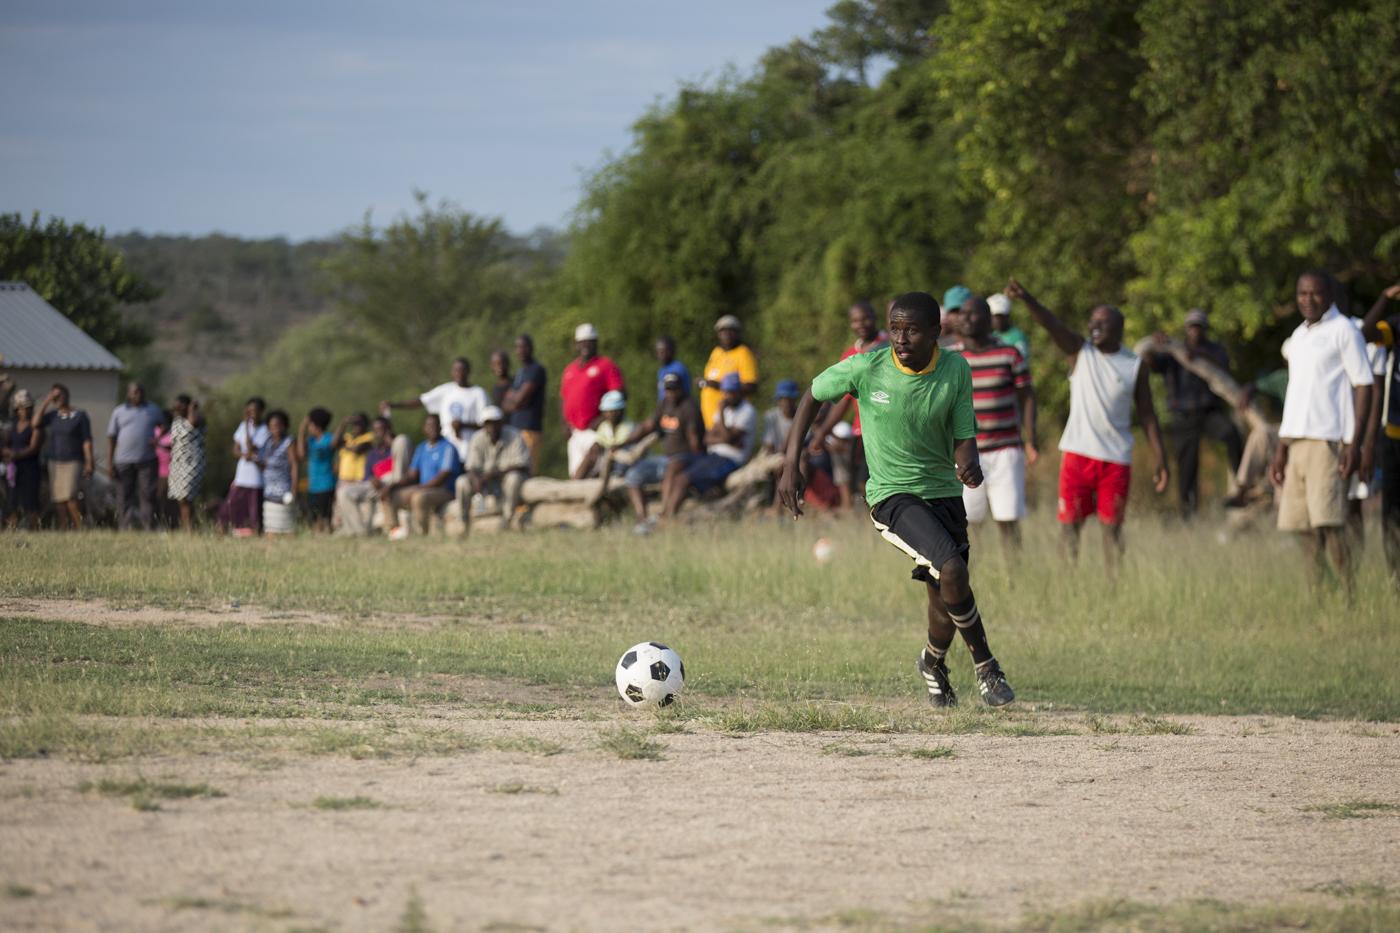 Reason Soccer